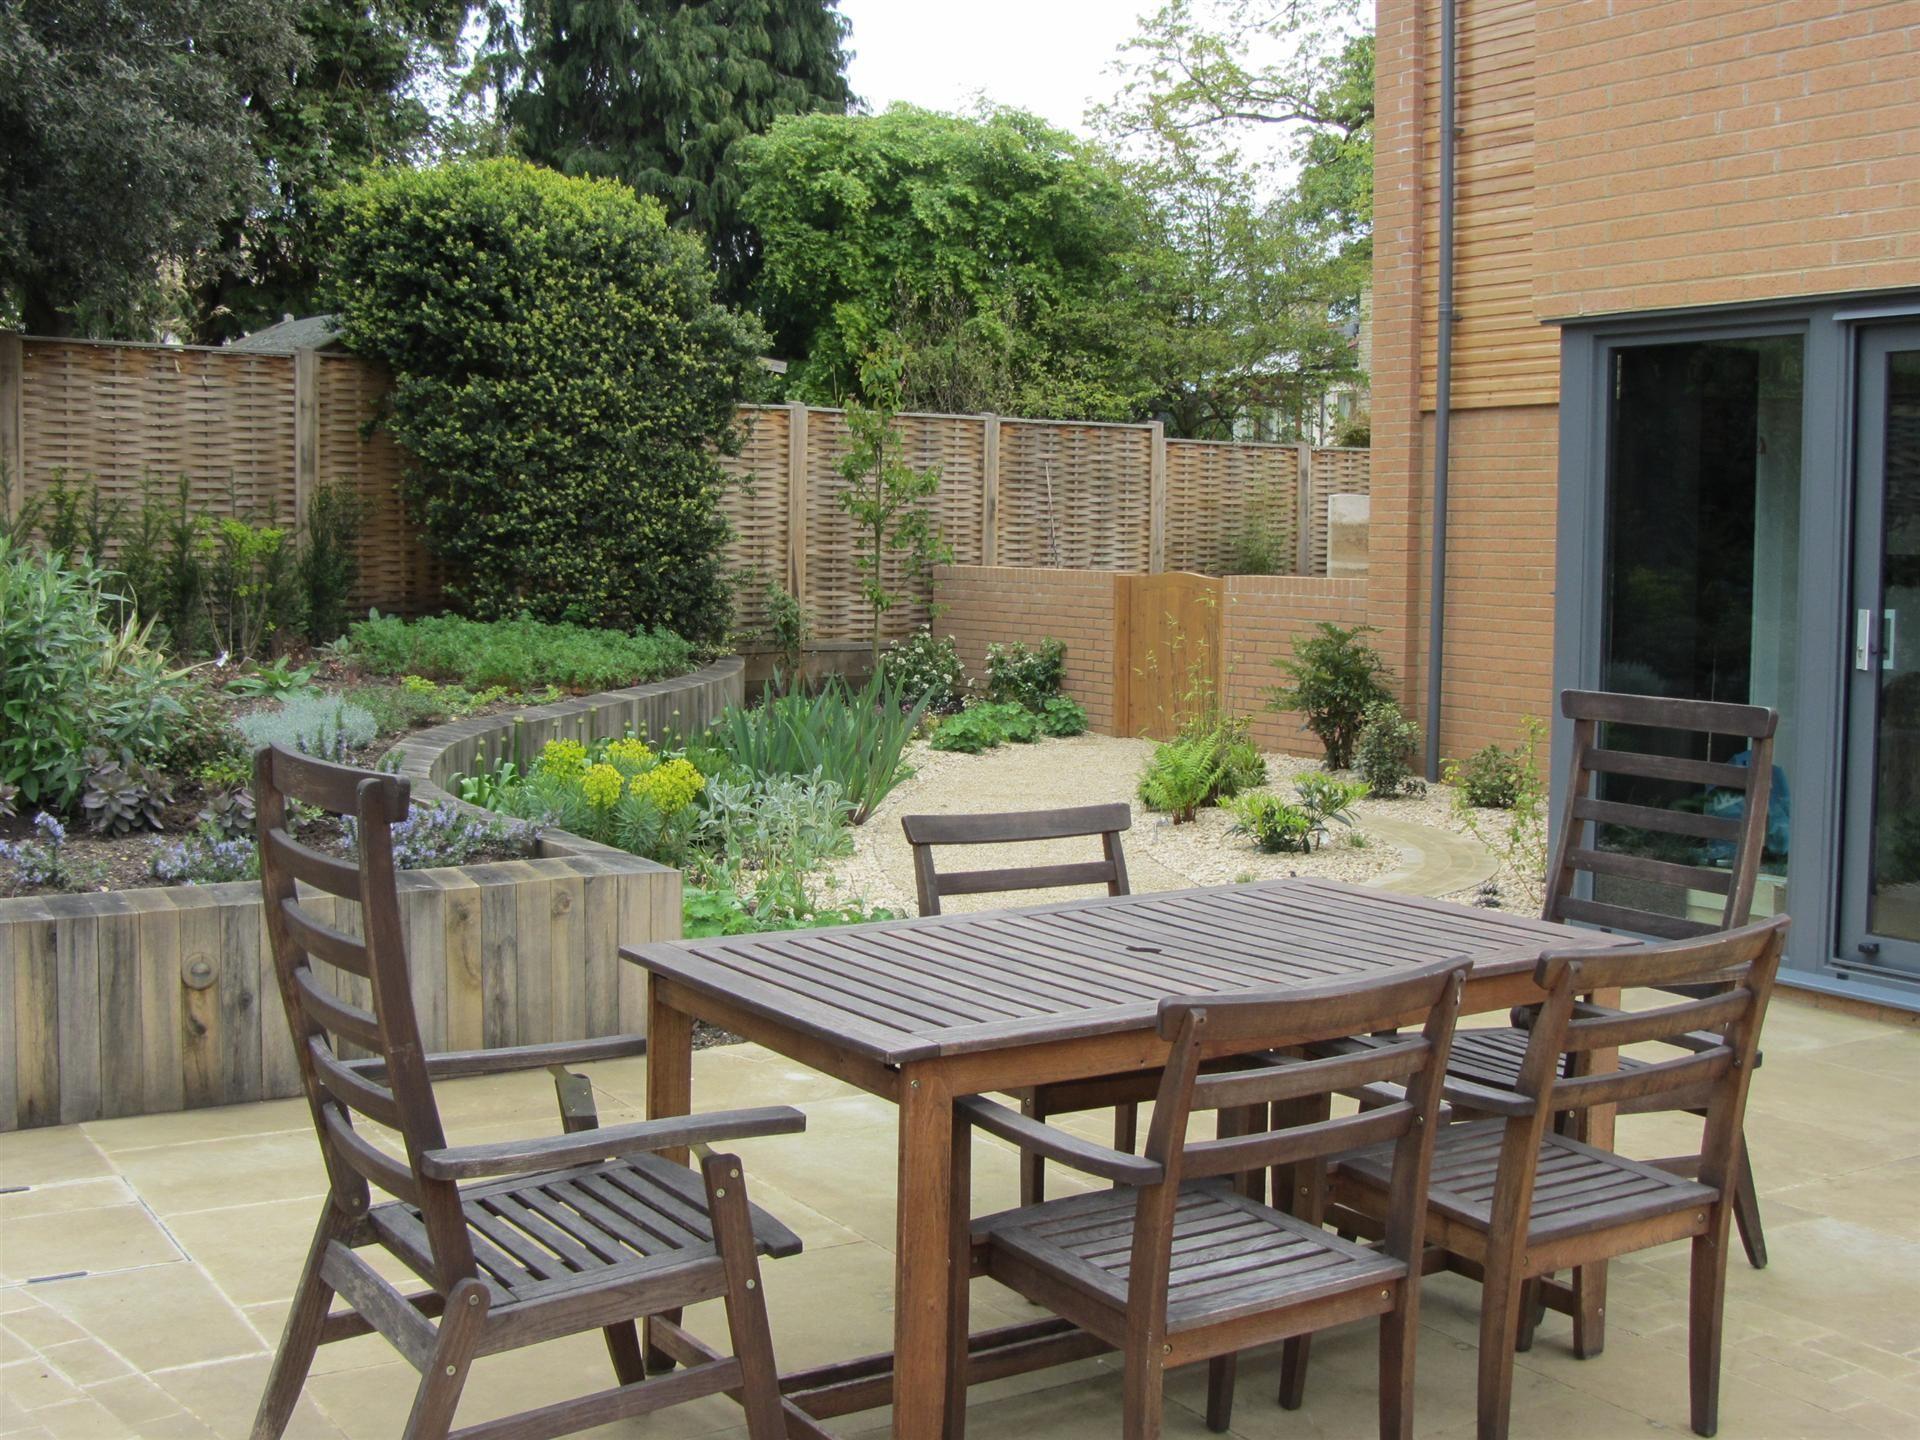 Sawn yorkstone terrace in contemporary garden by Rose Lennard